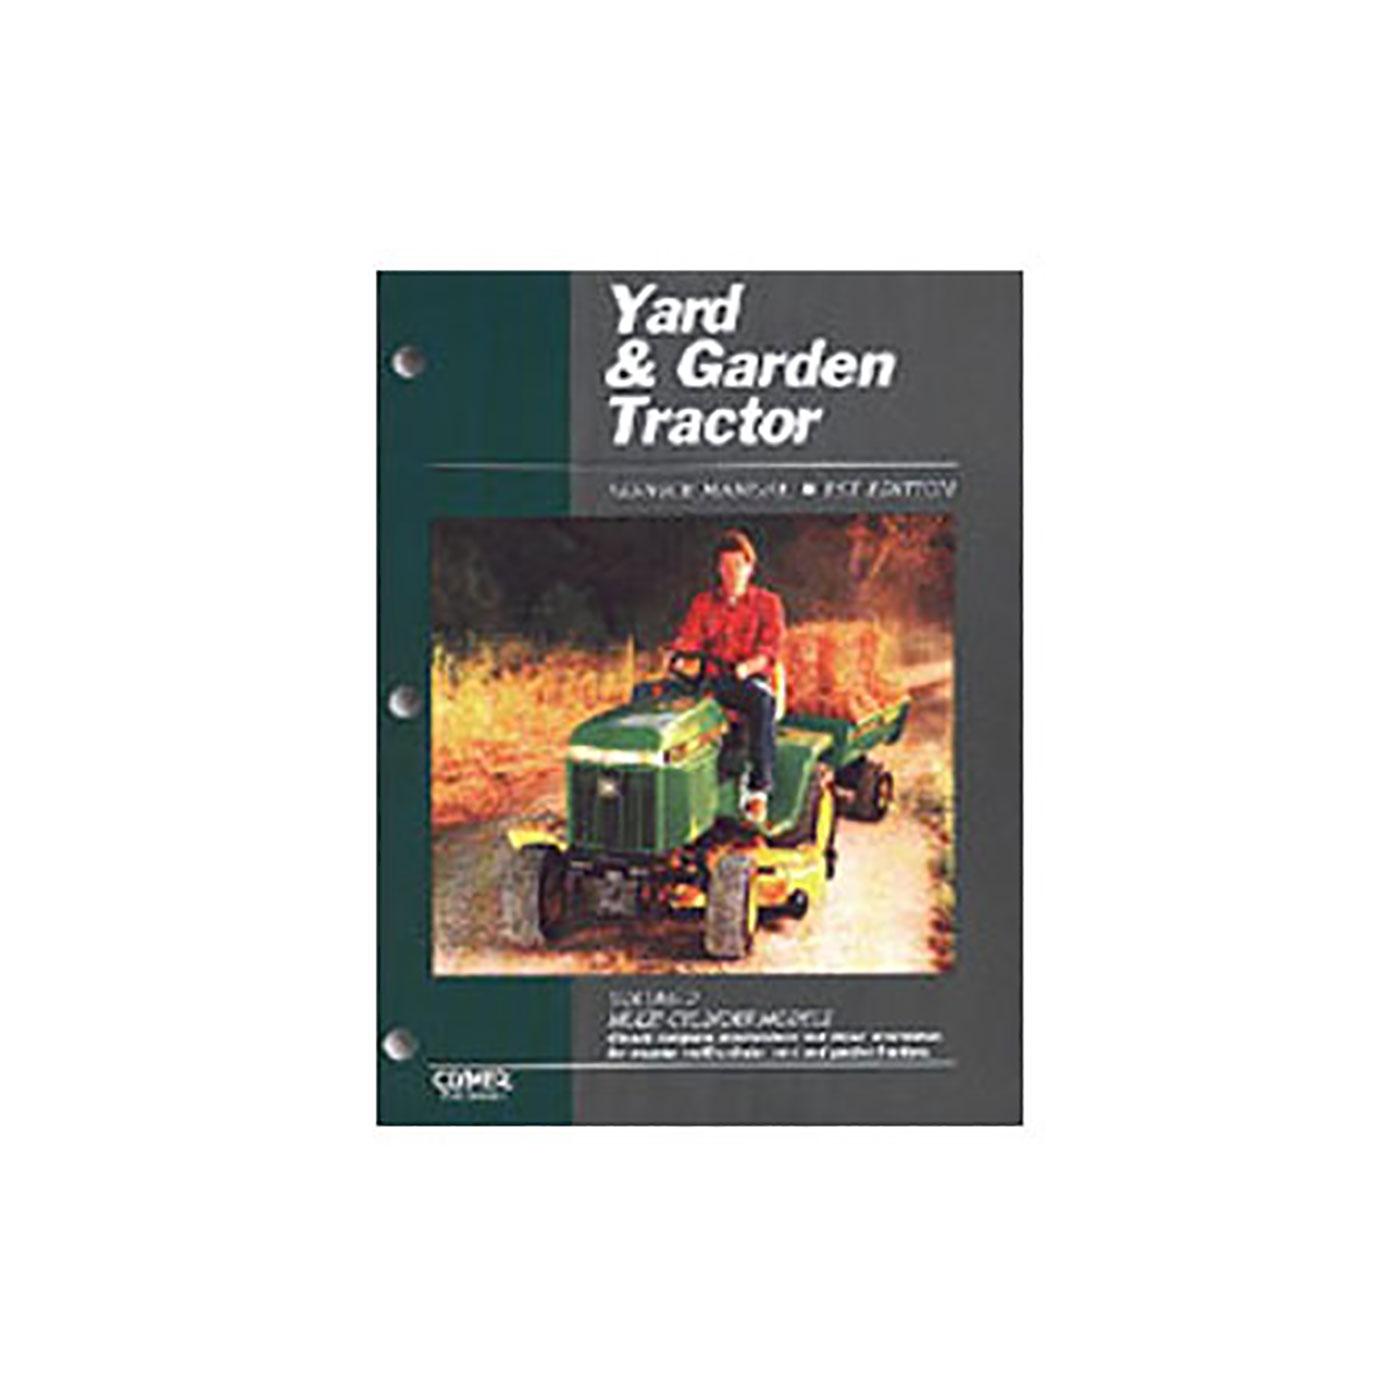 Yard & Garden Tractors (Multi-cylinder models)